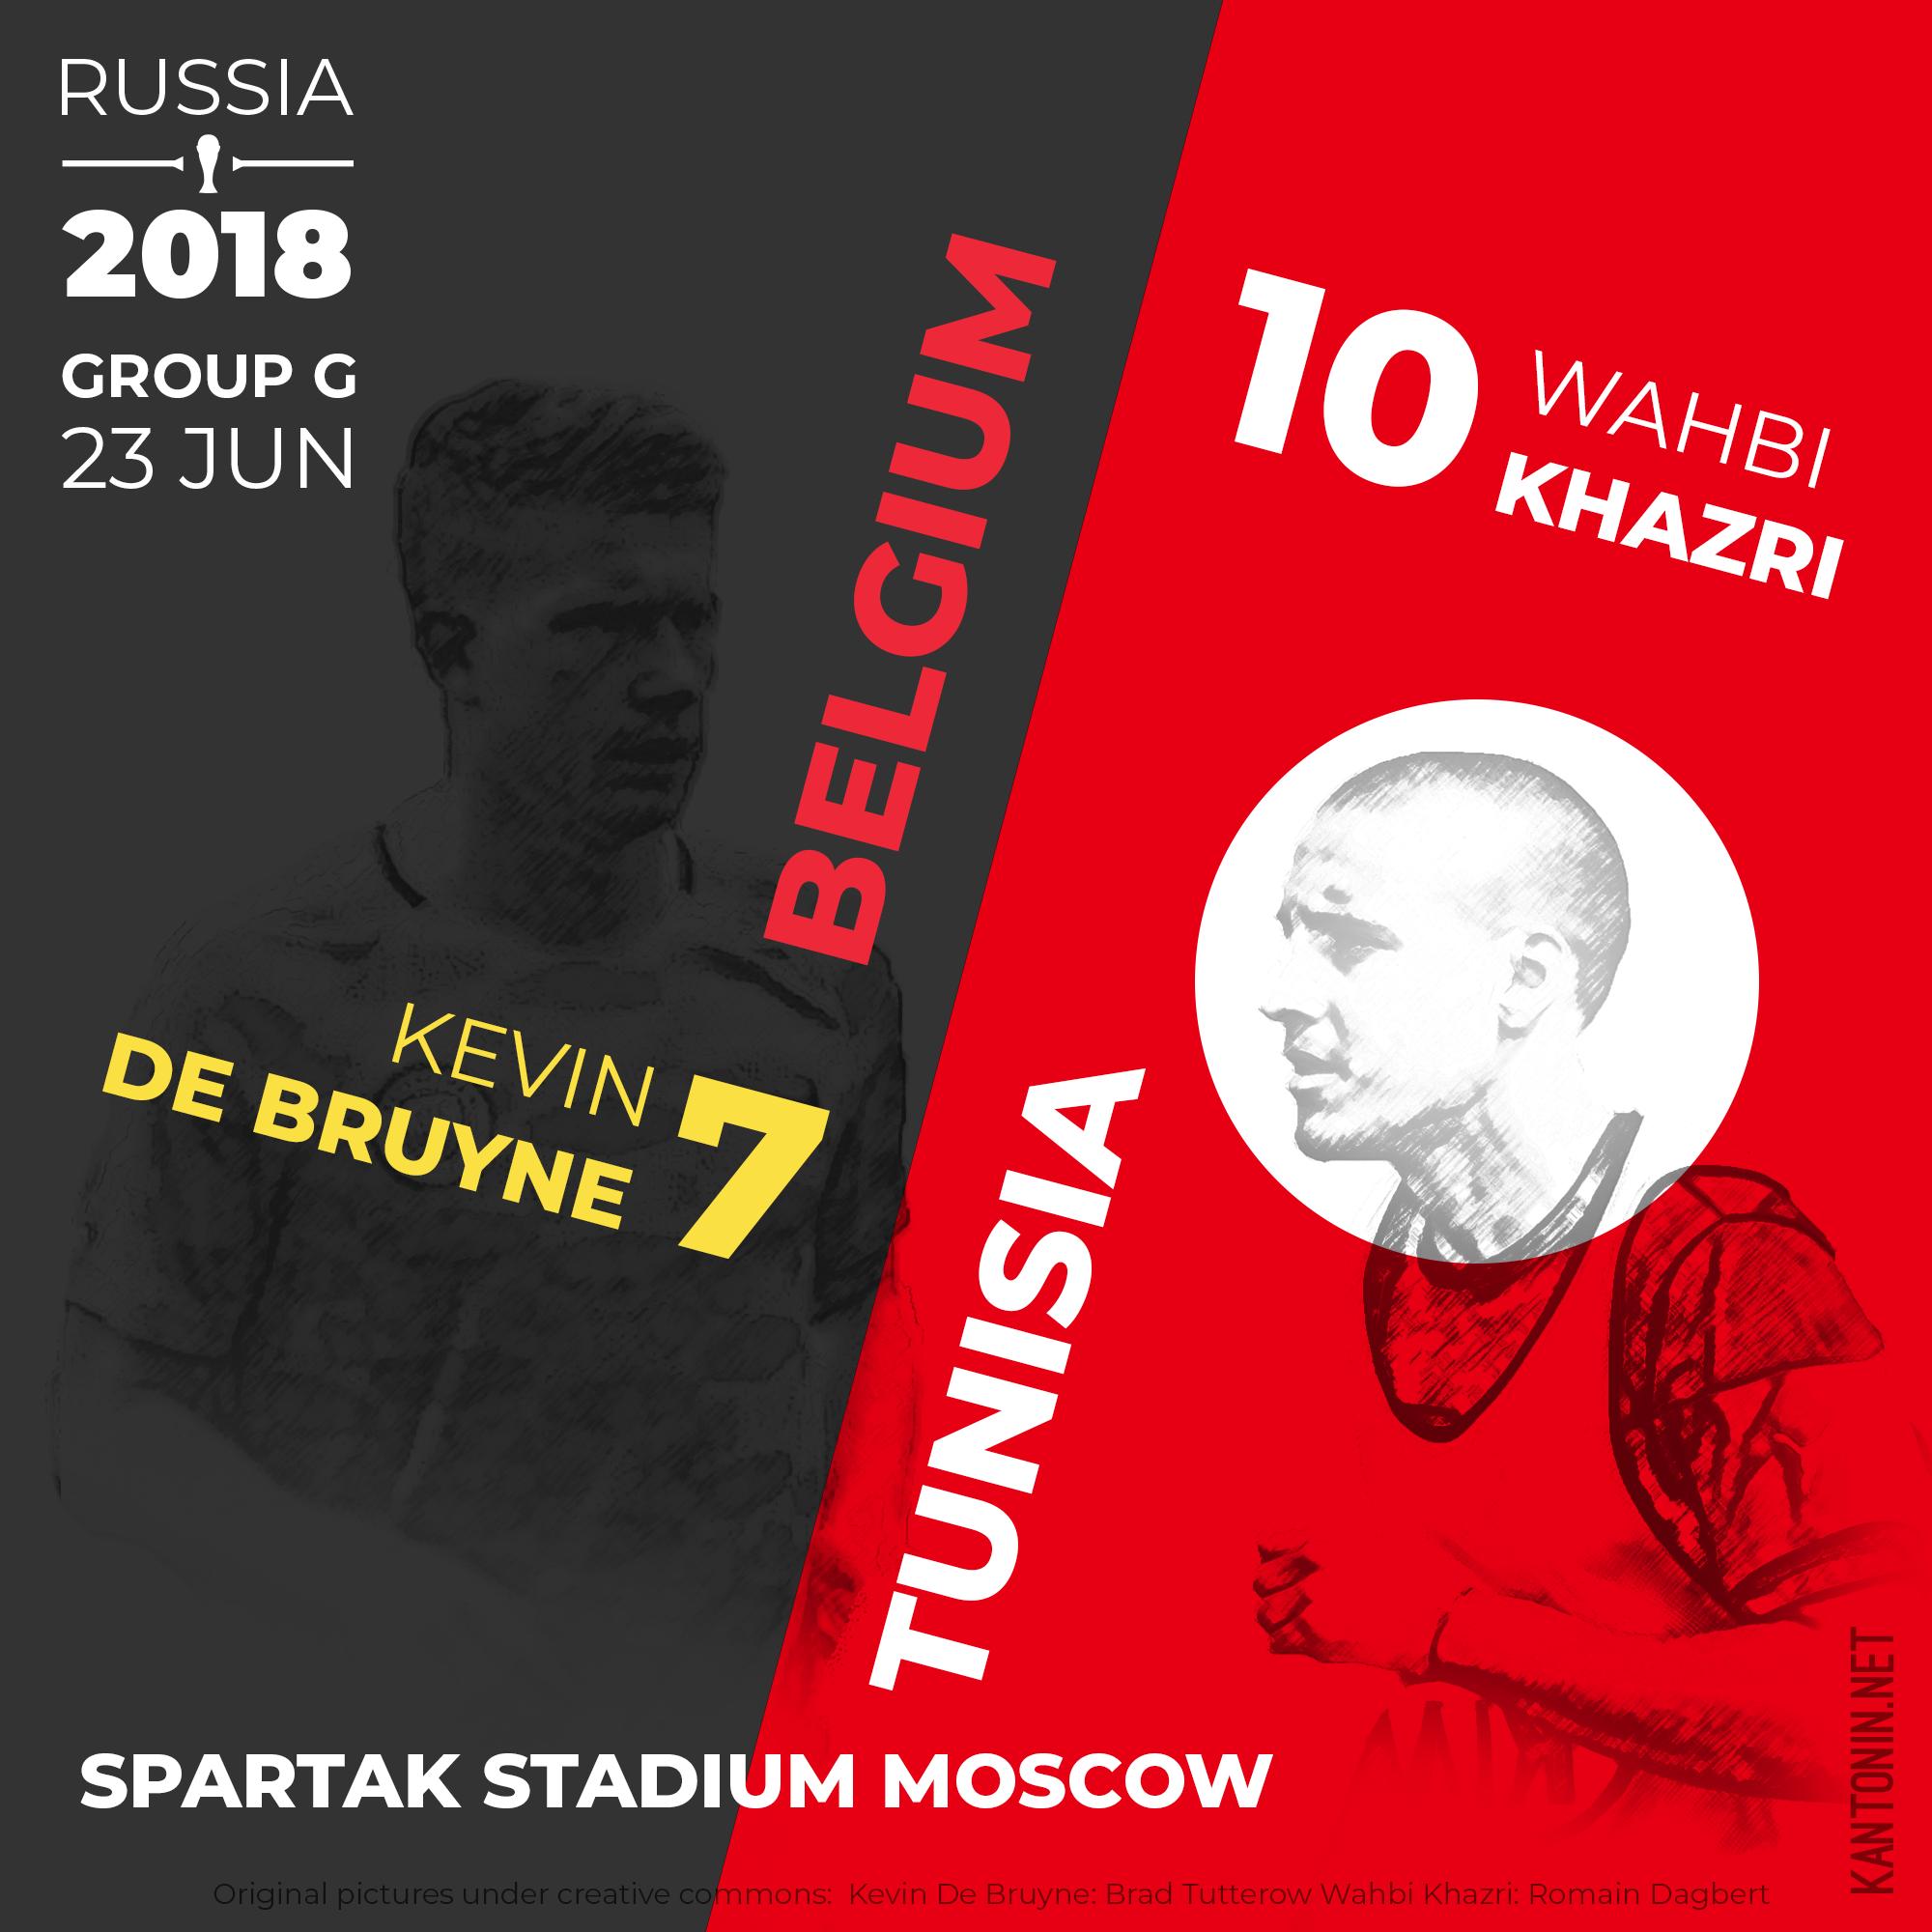 belgium-tunisia_russia2018_Antonin-Kaminski